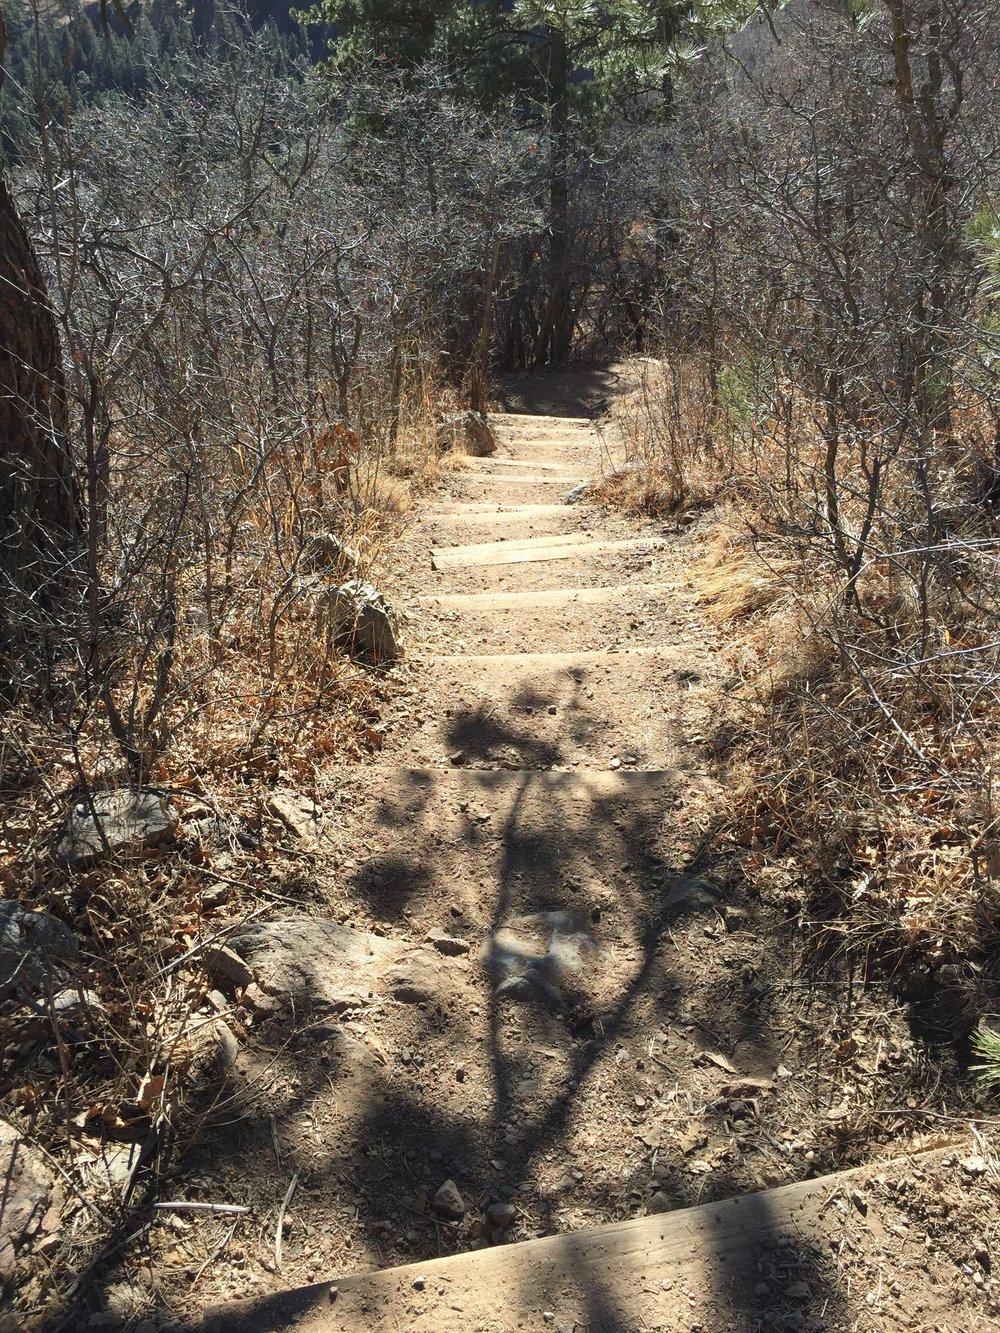 Ryan Stikeleather Break Trail Photography (www.breaktrailphotography.com)